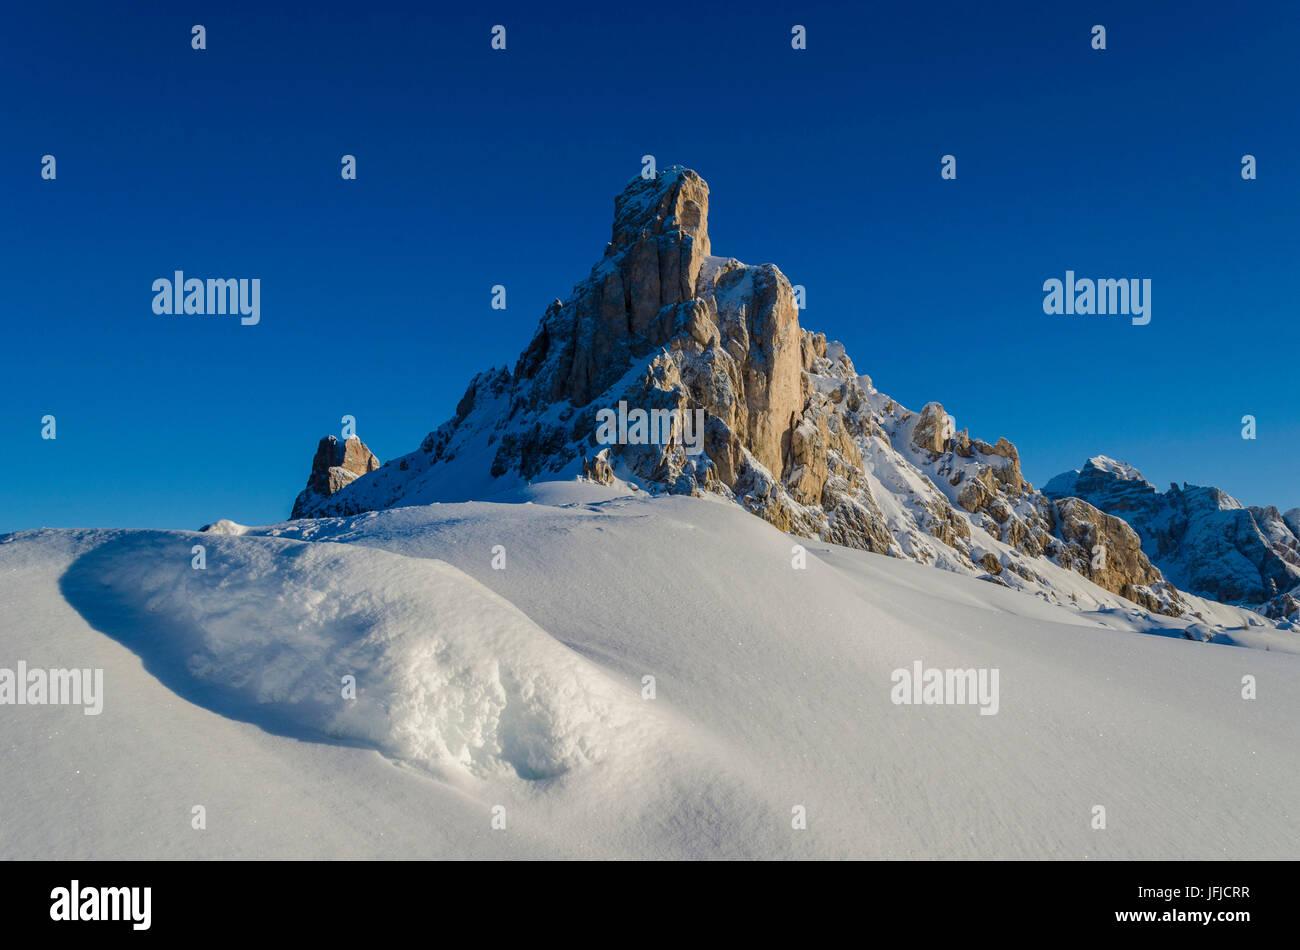 Ra Gusela, Giau Pass, Cortina d'Ampezzo, Dolomiti, Dolomites, Veneto, Italy, Sunrise at Giau Pass - Stock Image